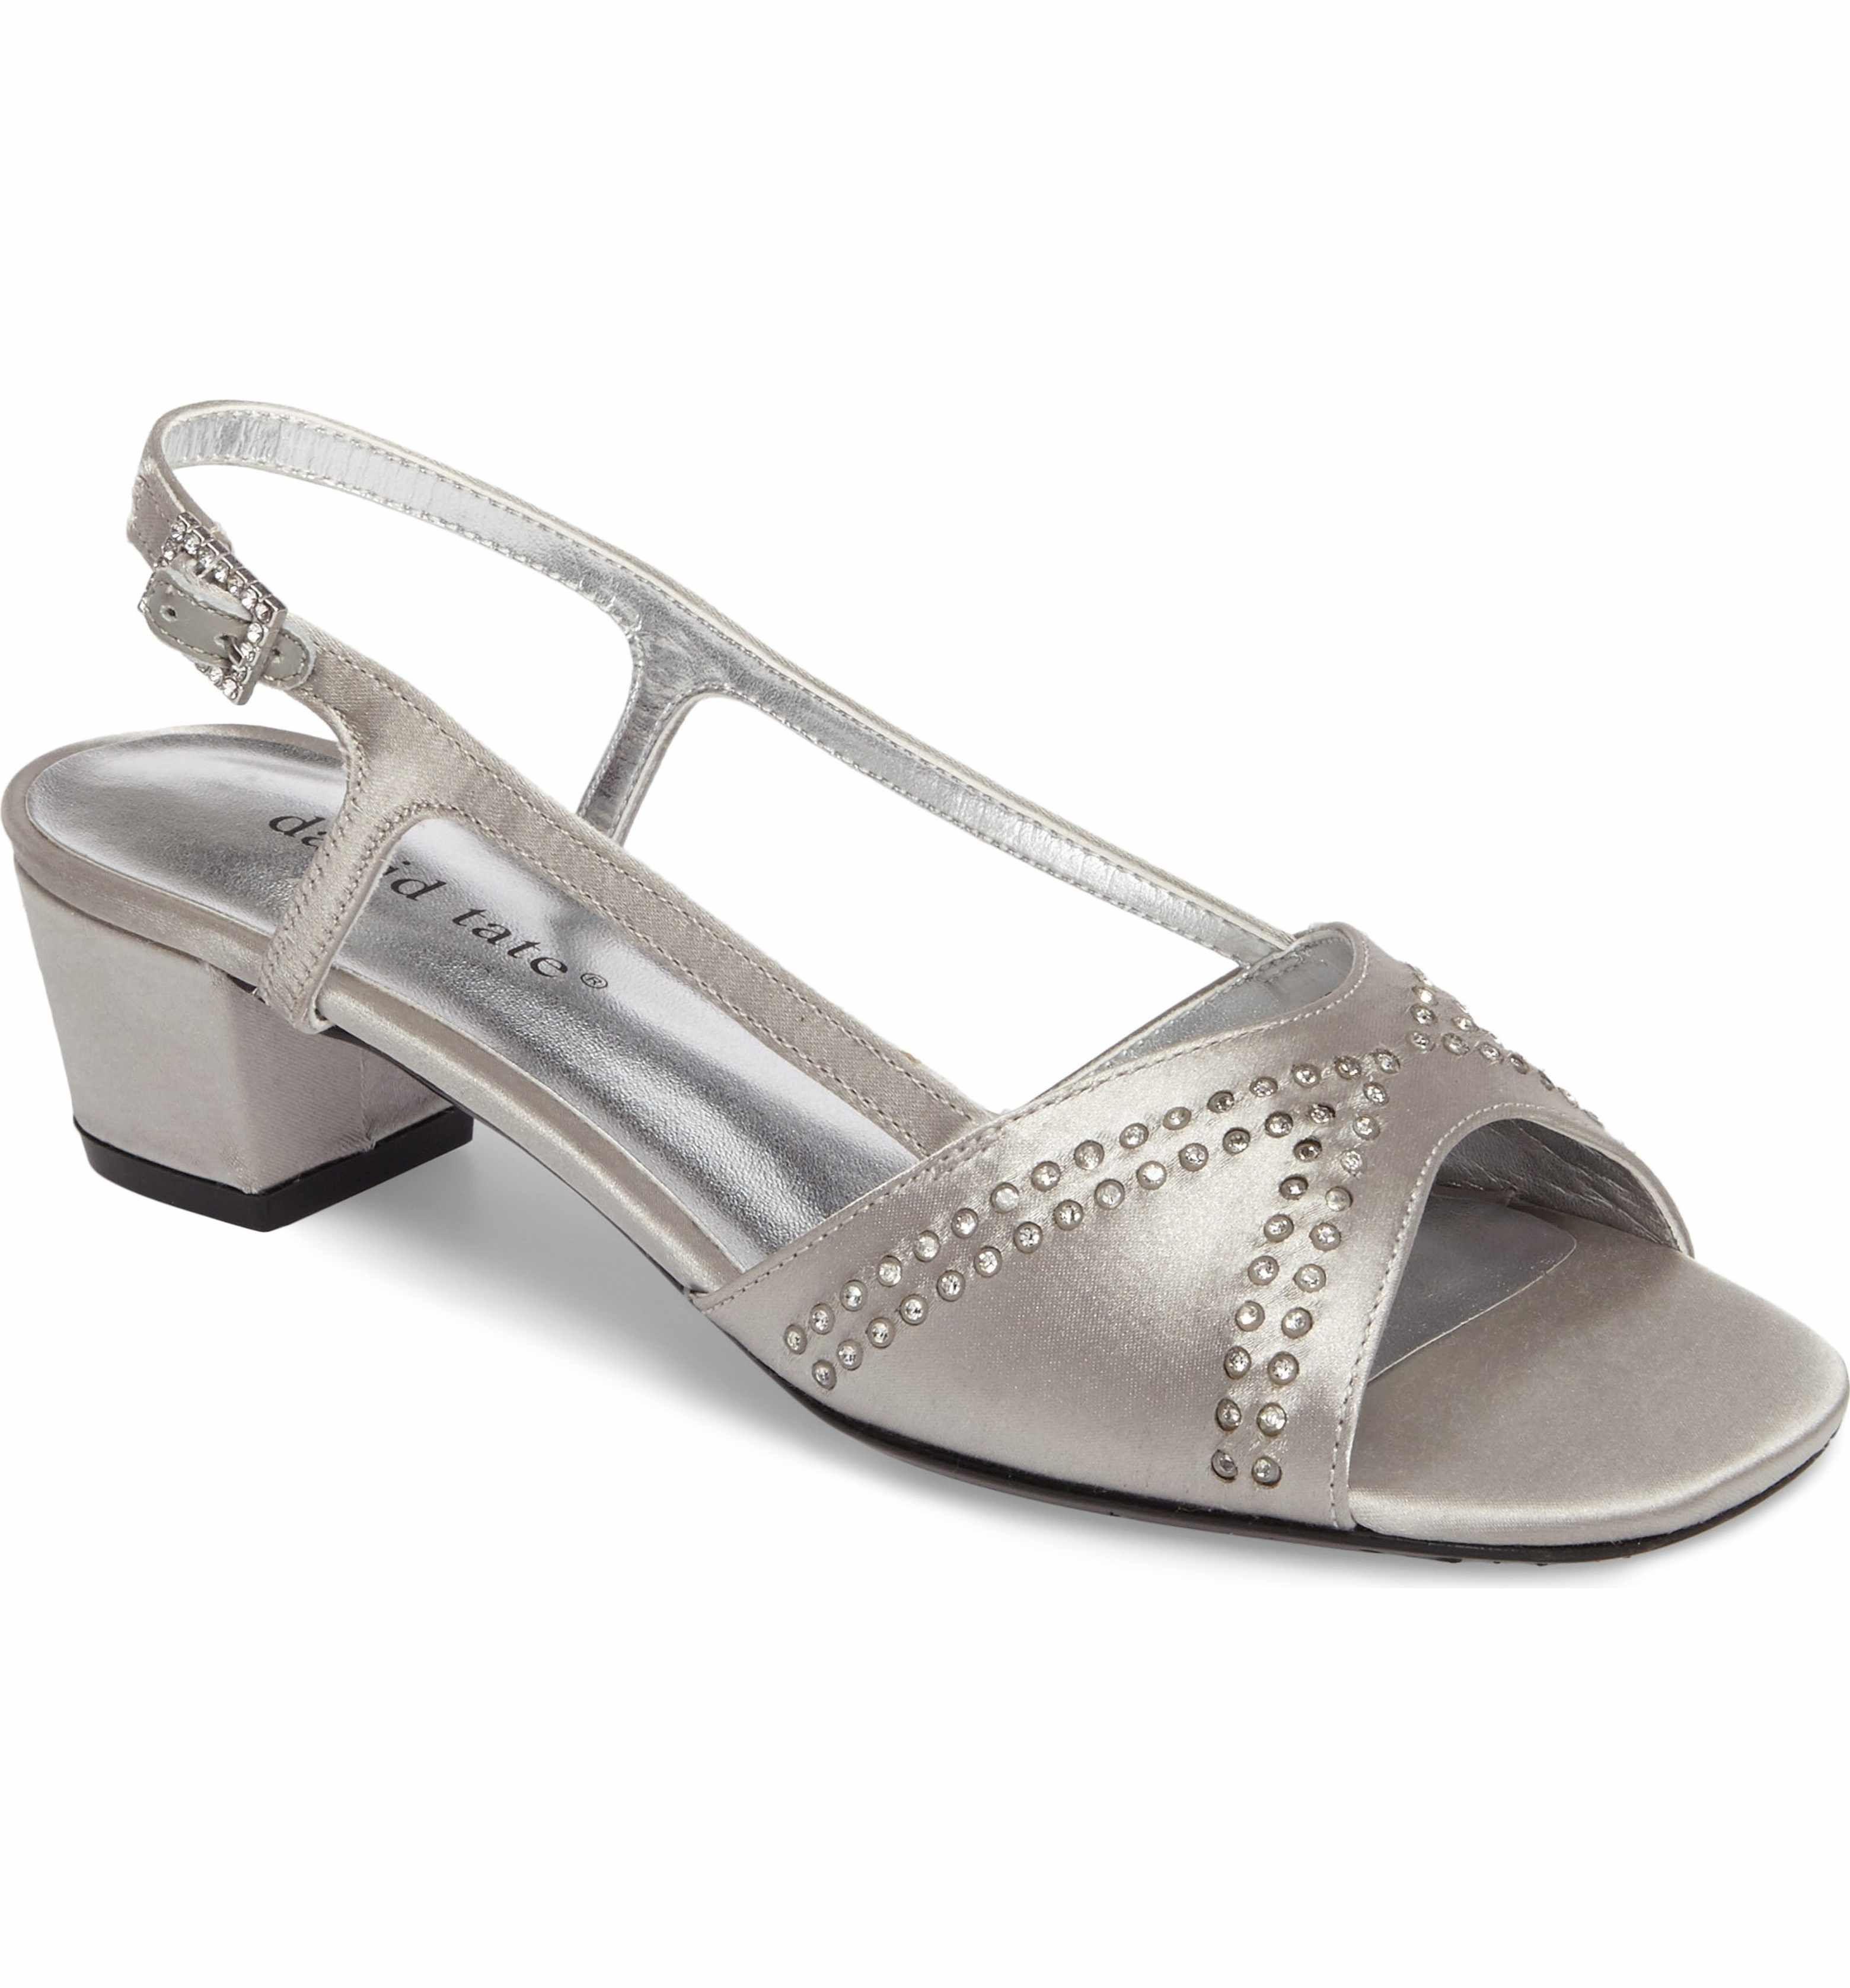 David Tate Women's Wish Slingback Sandal